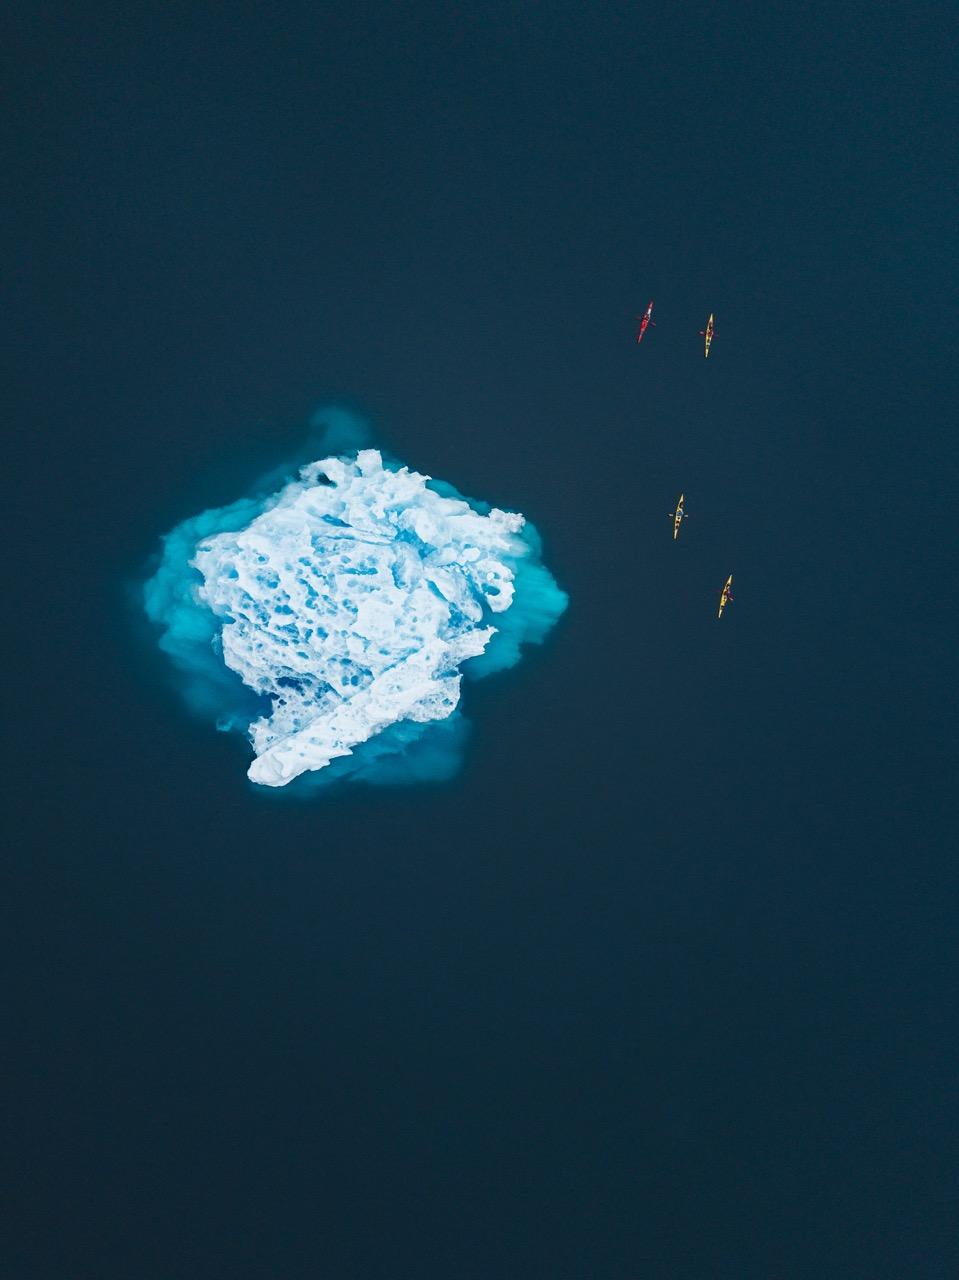 Greenland-Kayak-Iceberg-Water-Blue